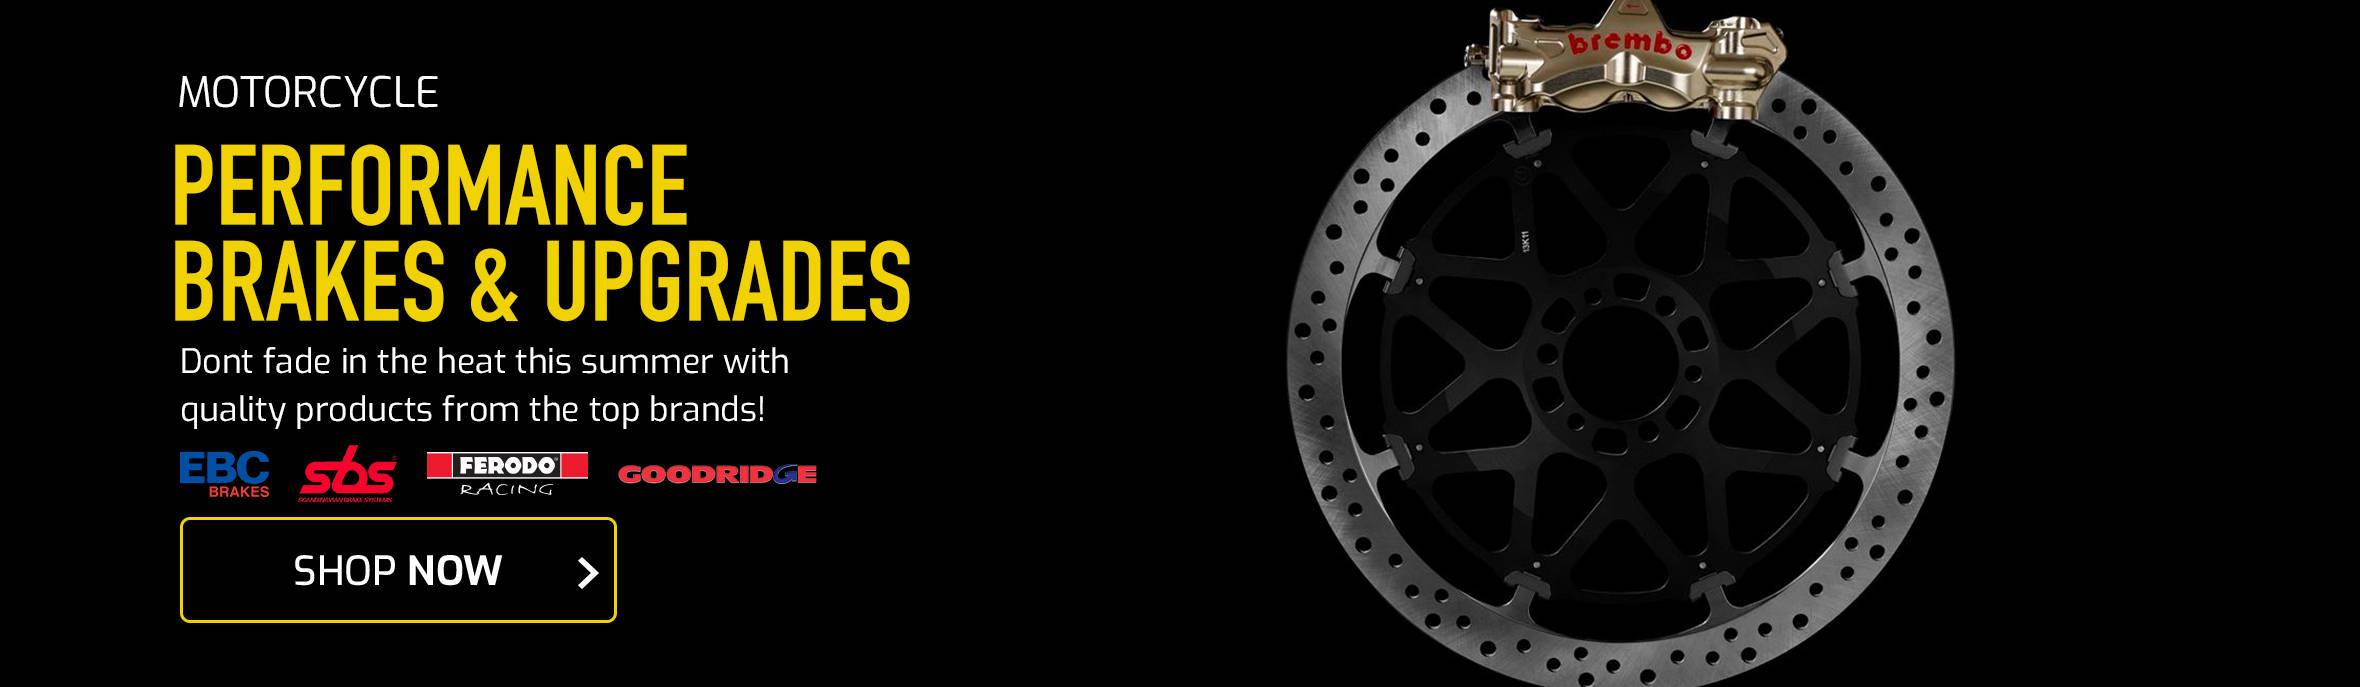 Motorcycle Performance Brakes & Upgrades